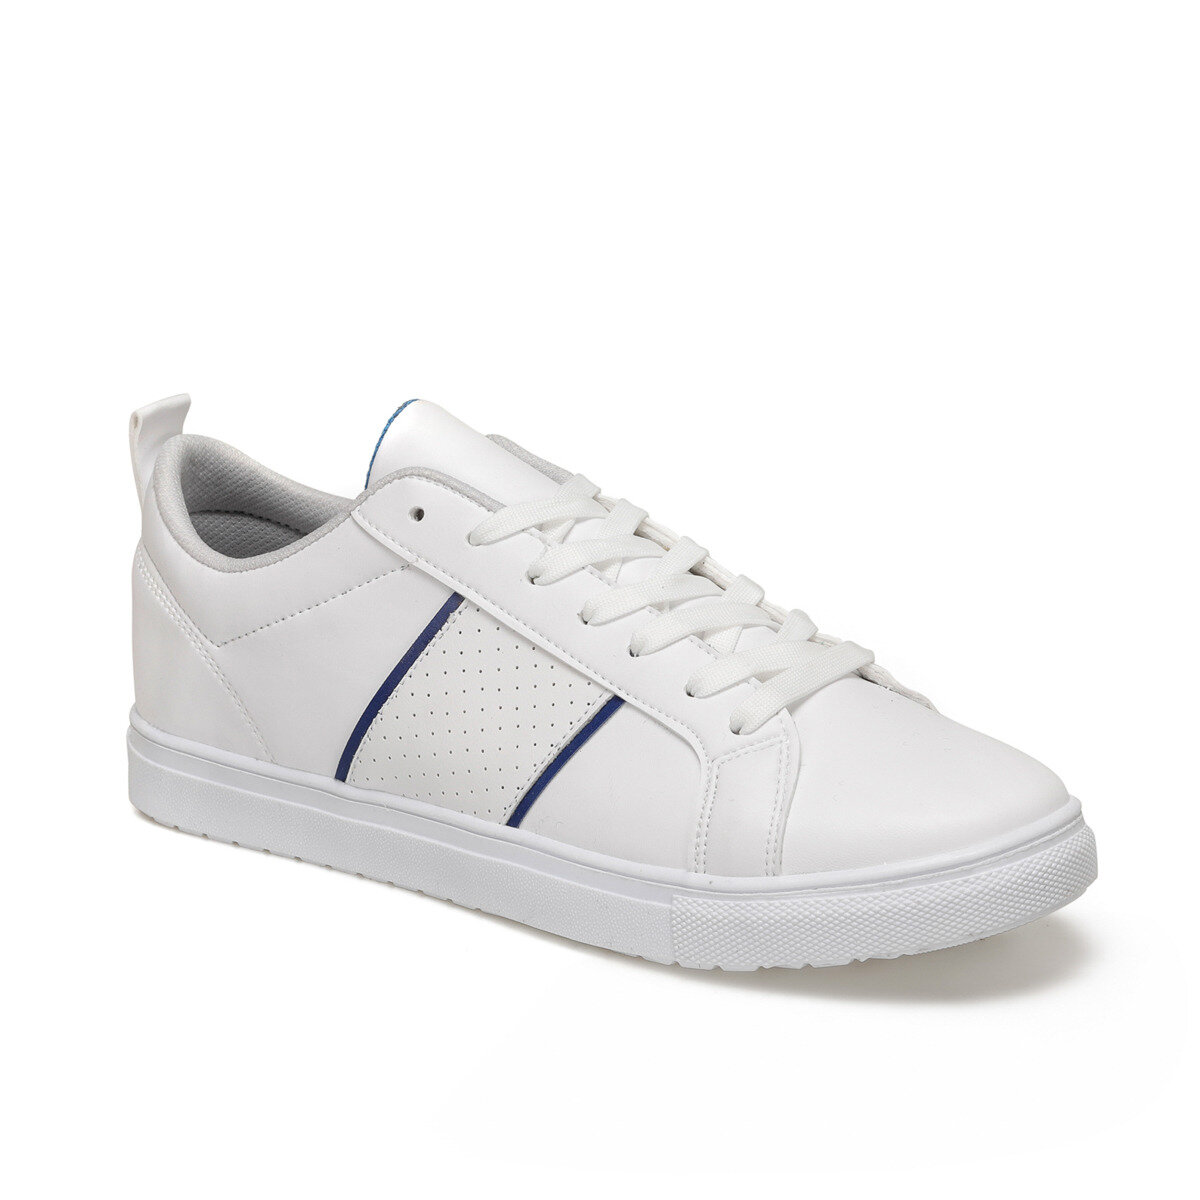 FLO LUCCA White Male Sneaker Torex